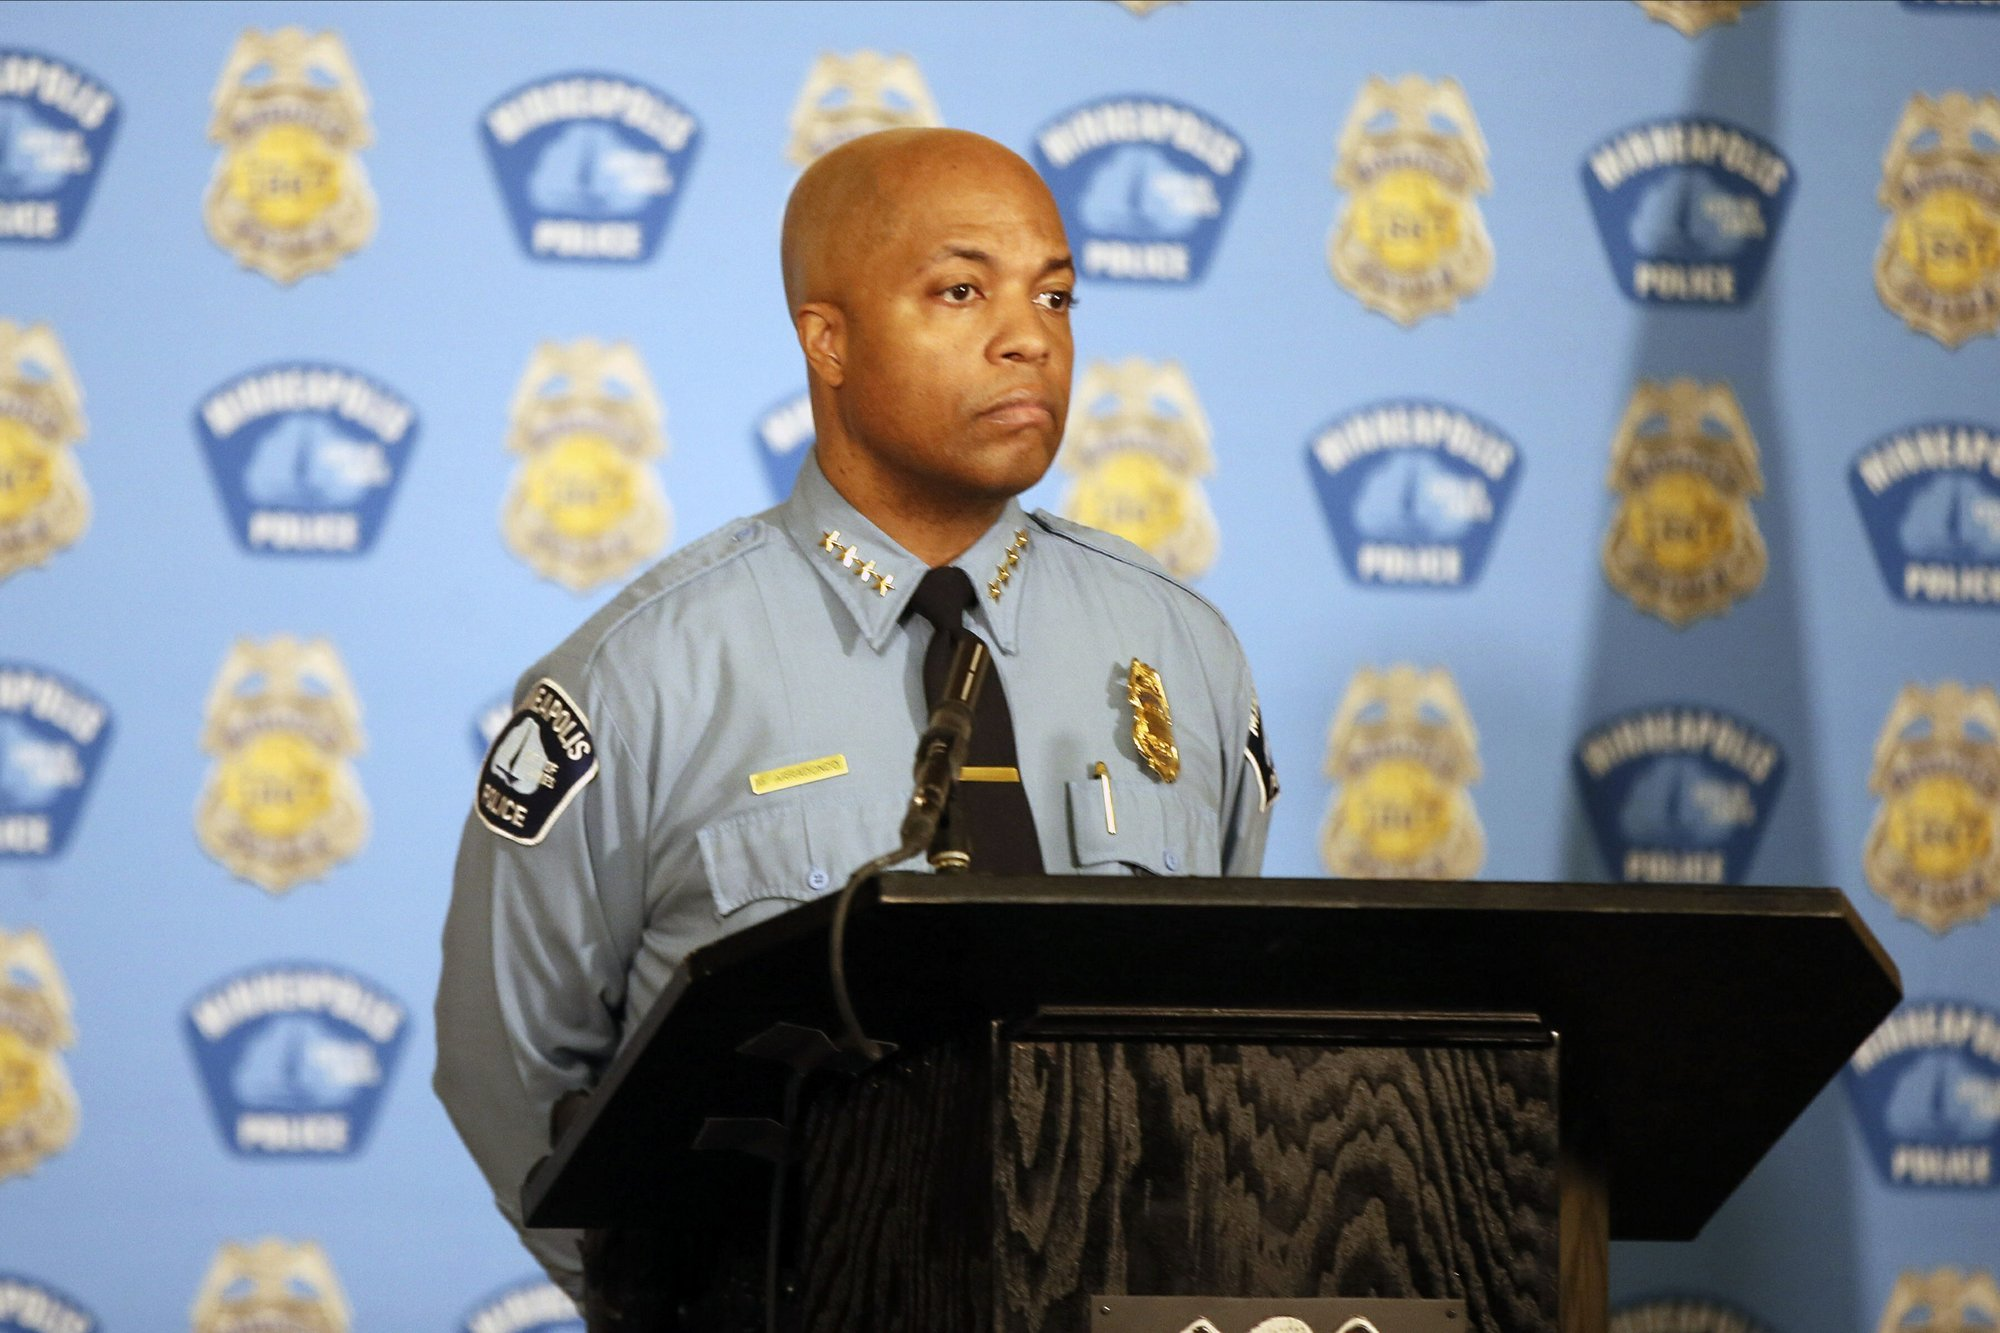 Minneapolis Police Chief Takes On Union Promises Change